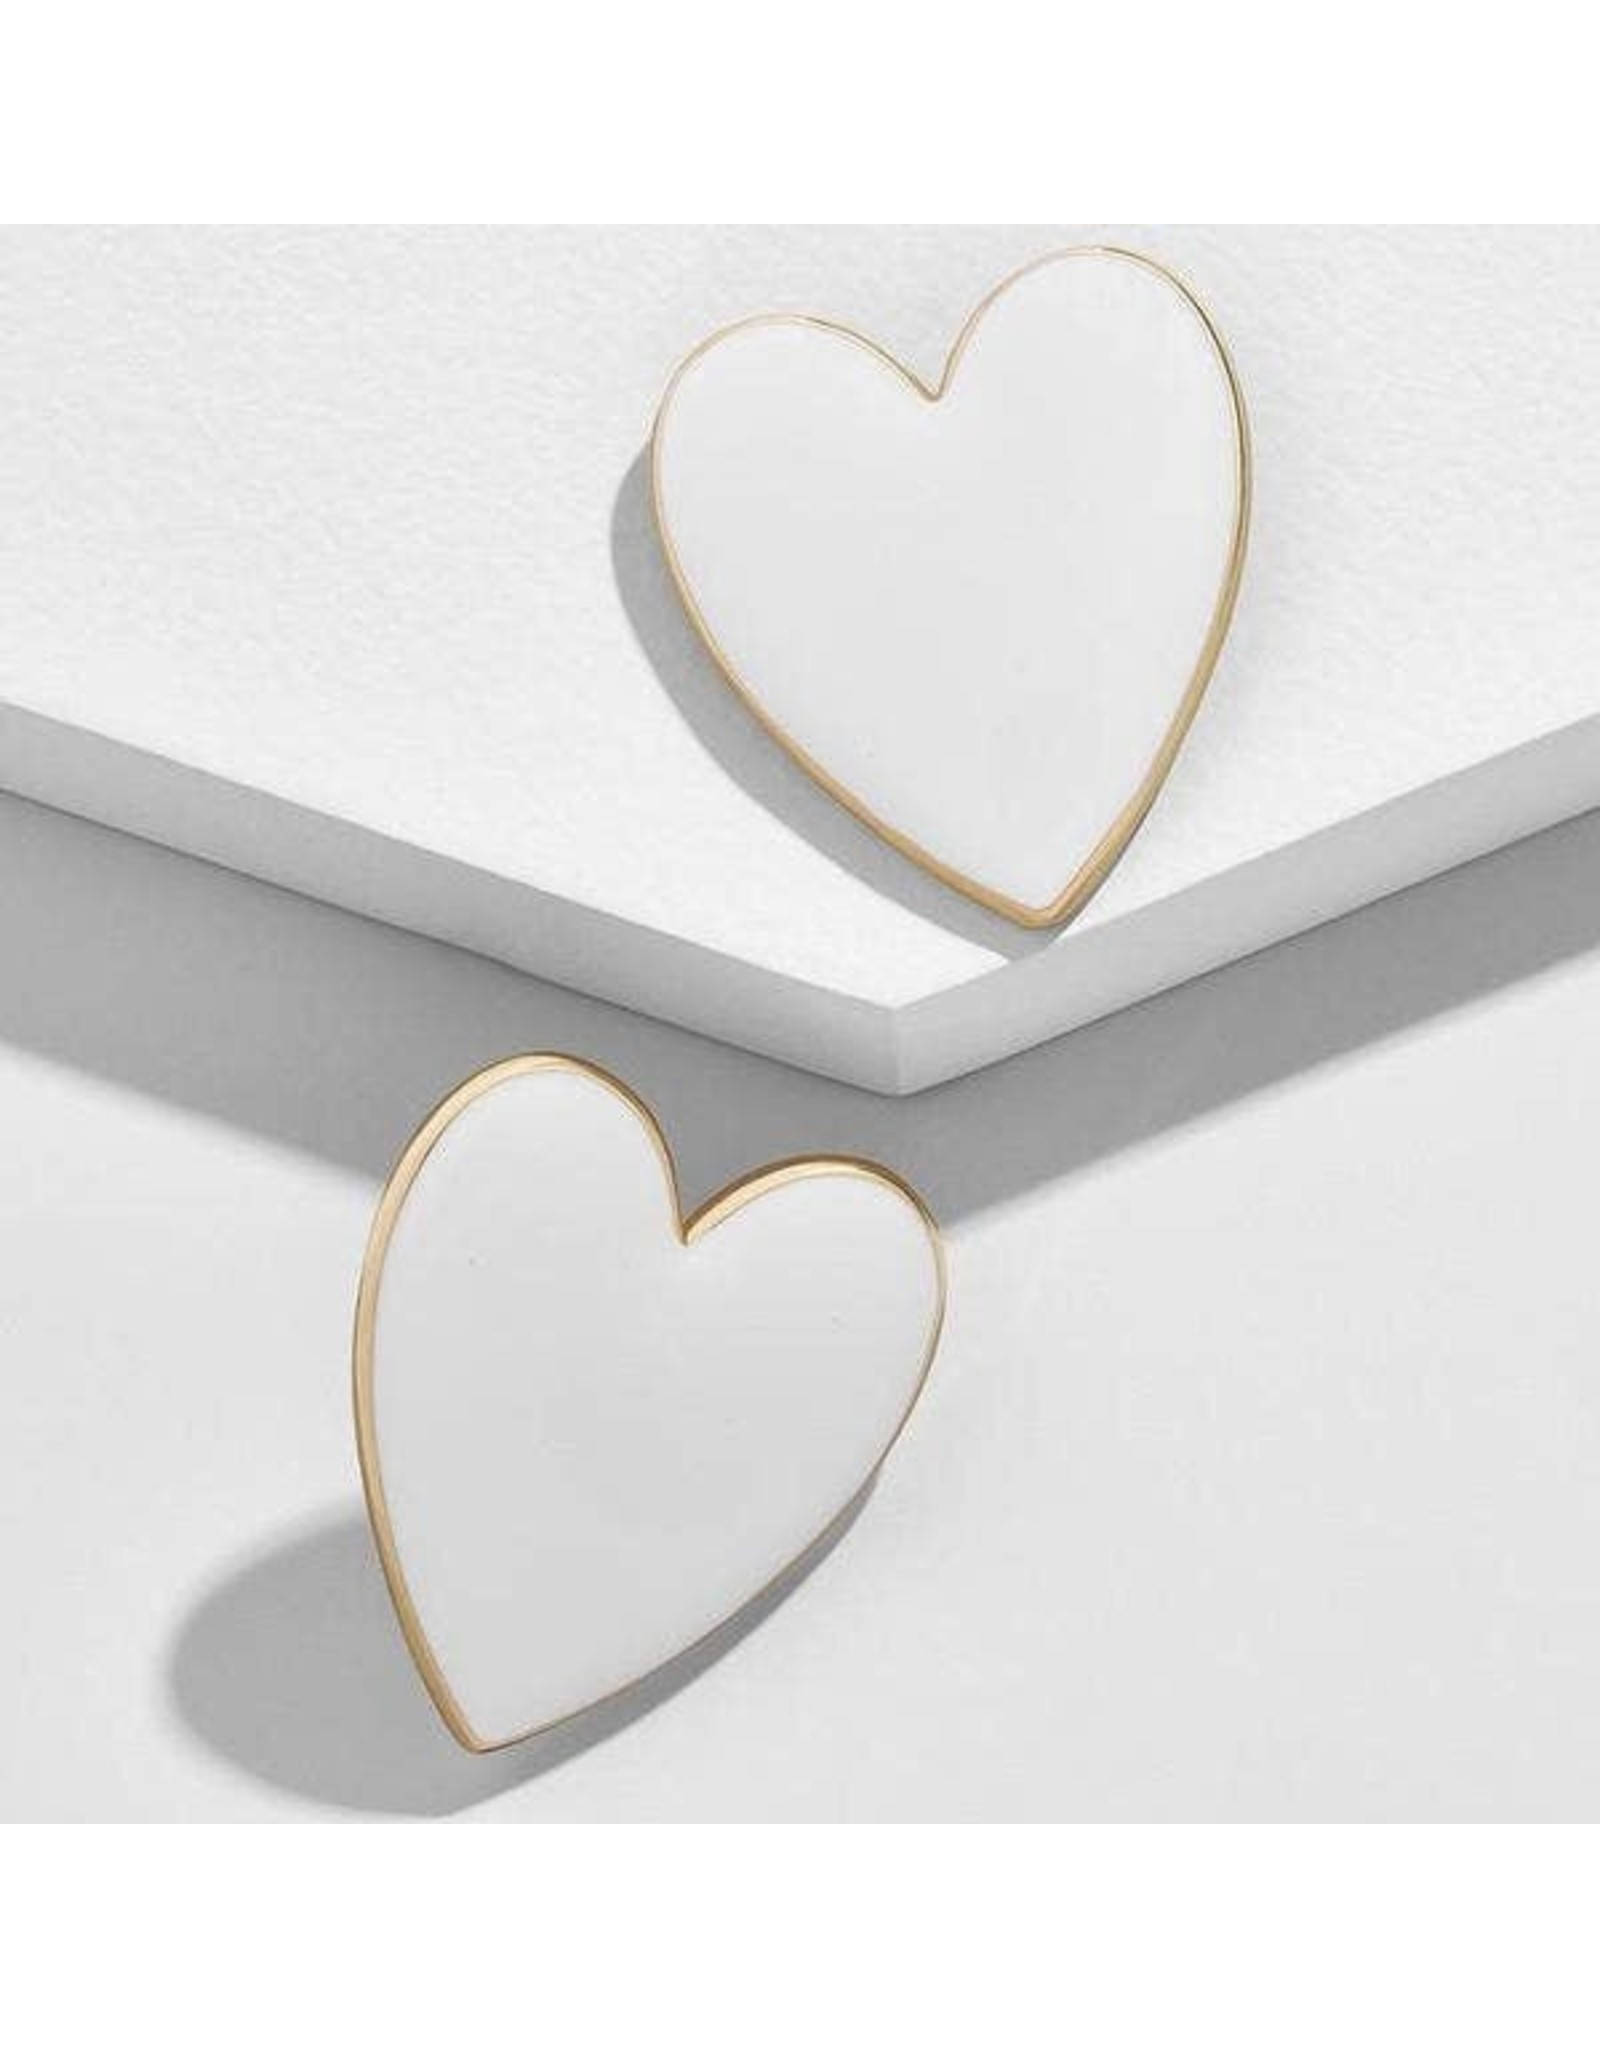 KOKO & LOLA WHITE & GOLD ACCENT HEART EARRINGS